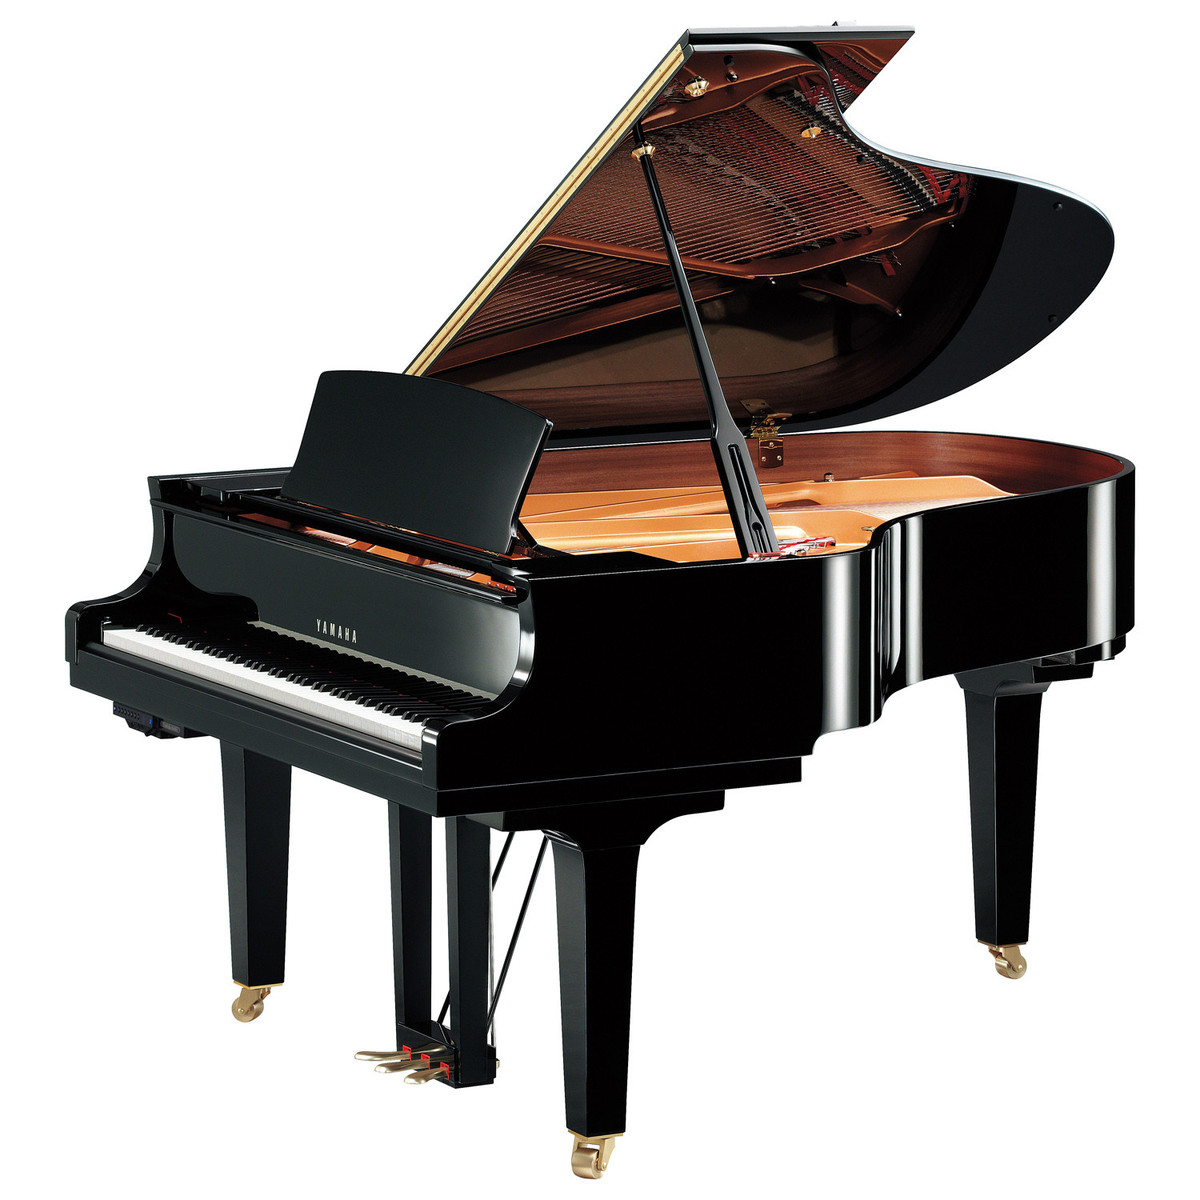 Yamaha TransAcoustic C3XTA Hybrid Grand Piano at Gear4music.com